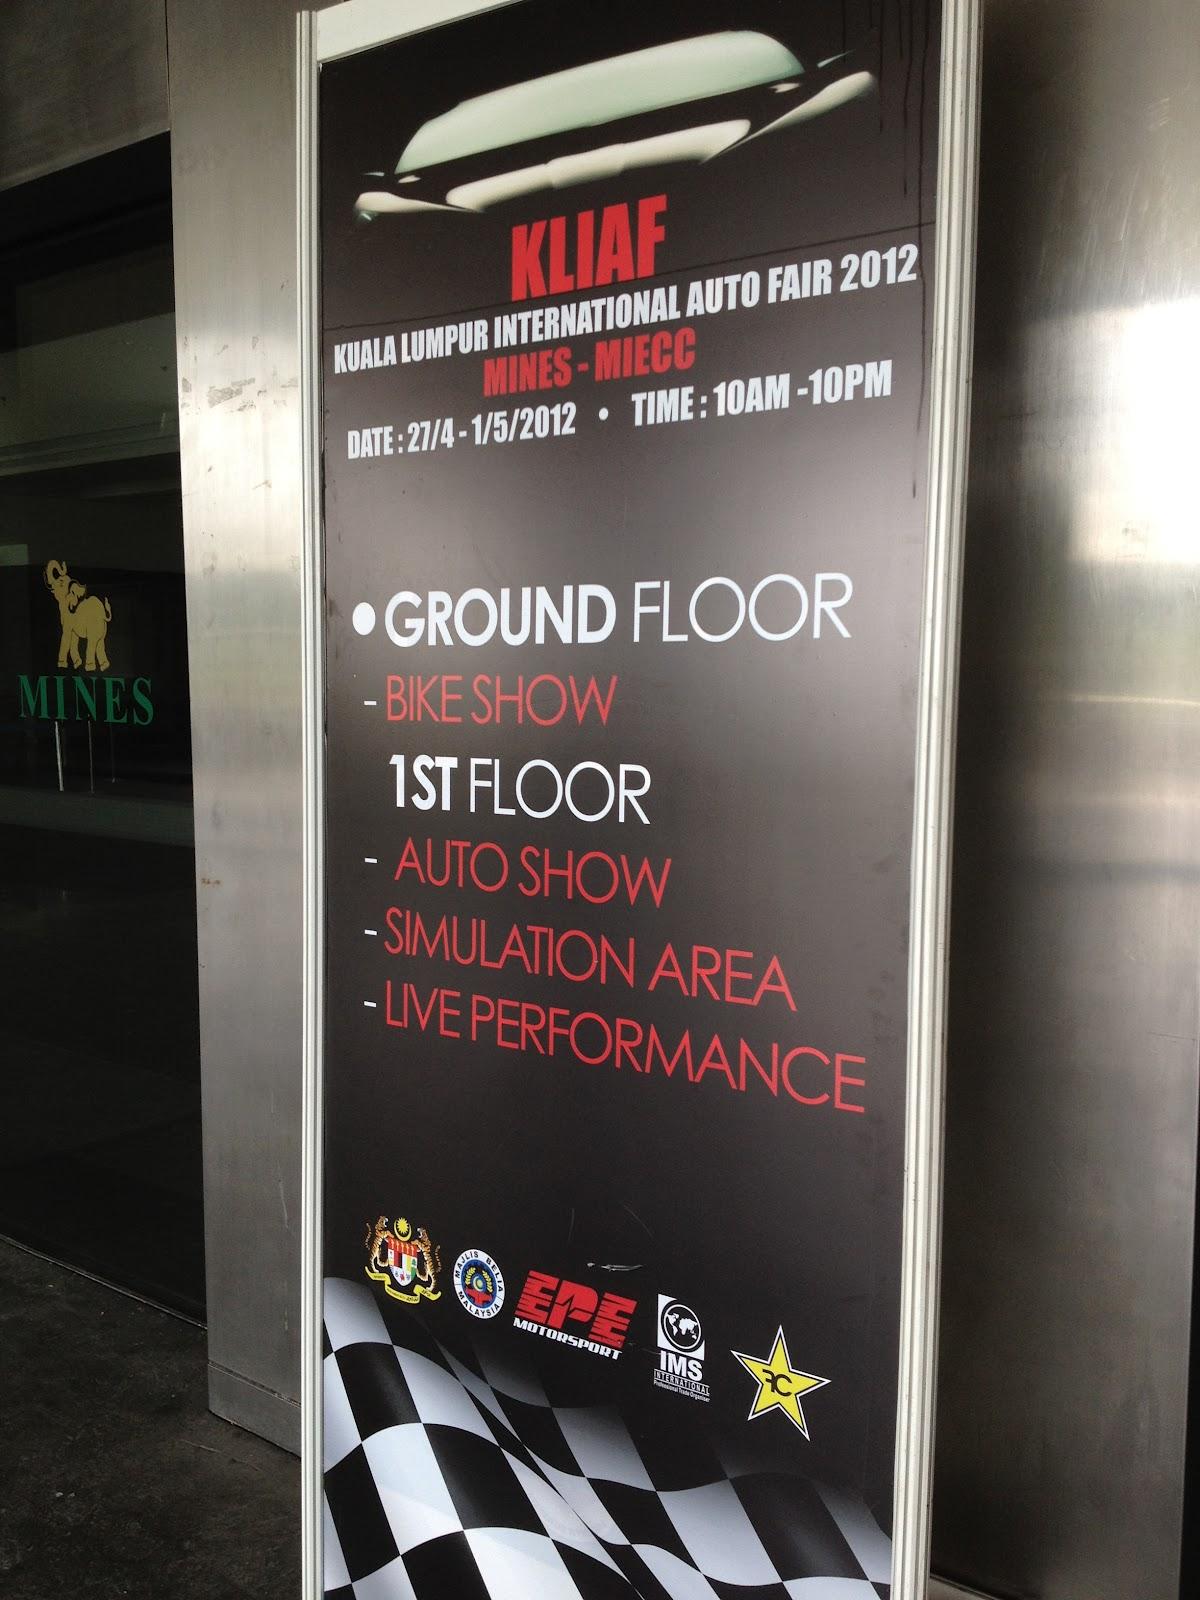 Kuala Lumpur International Auto Fair 2012 What a rip off kensomuse